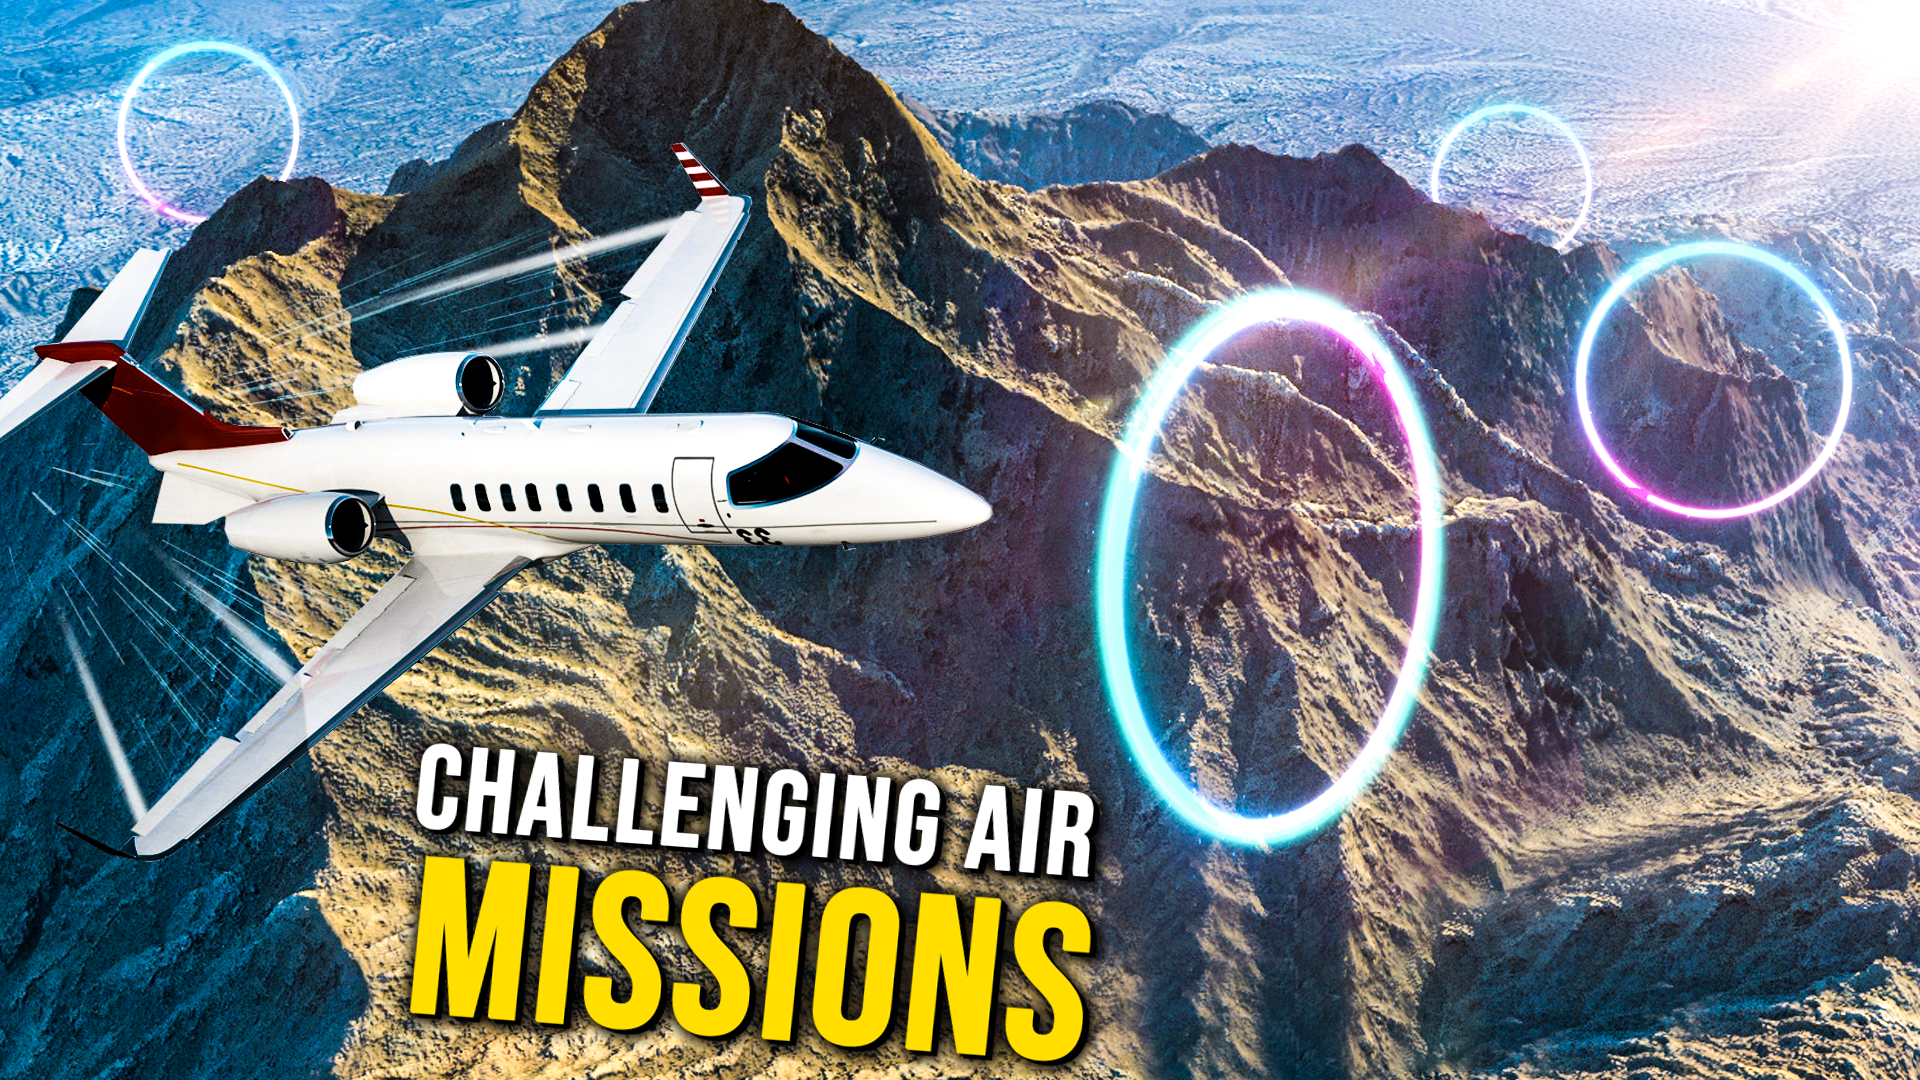 Pin by Tahir Mughal on Games Designs | Airplane pilot, Fly plane